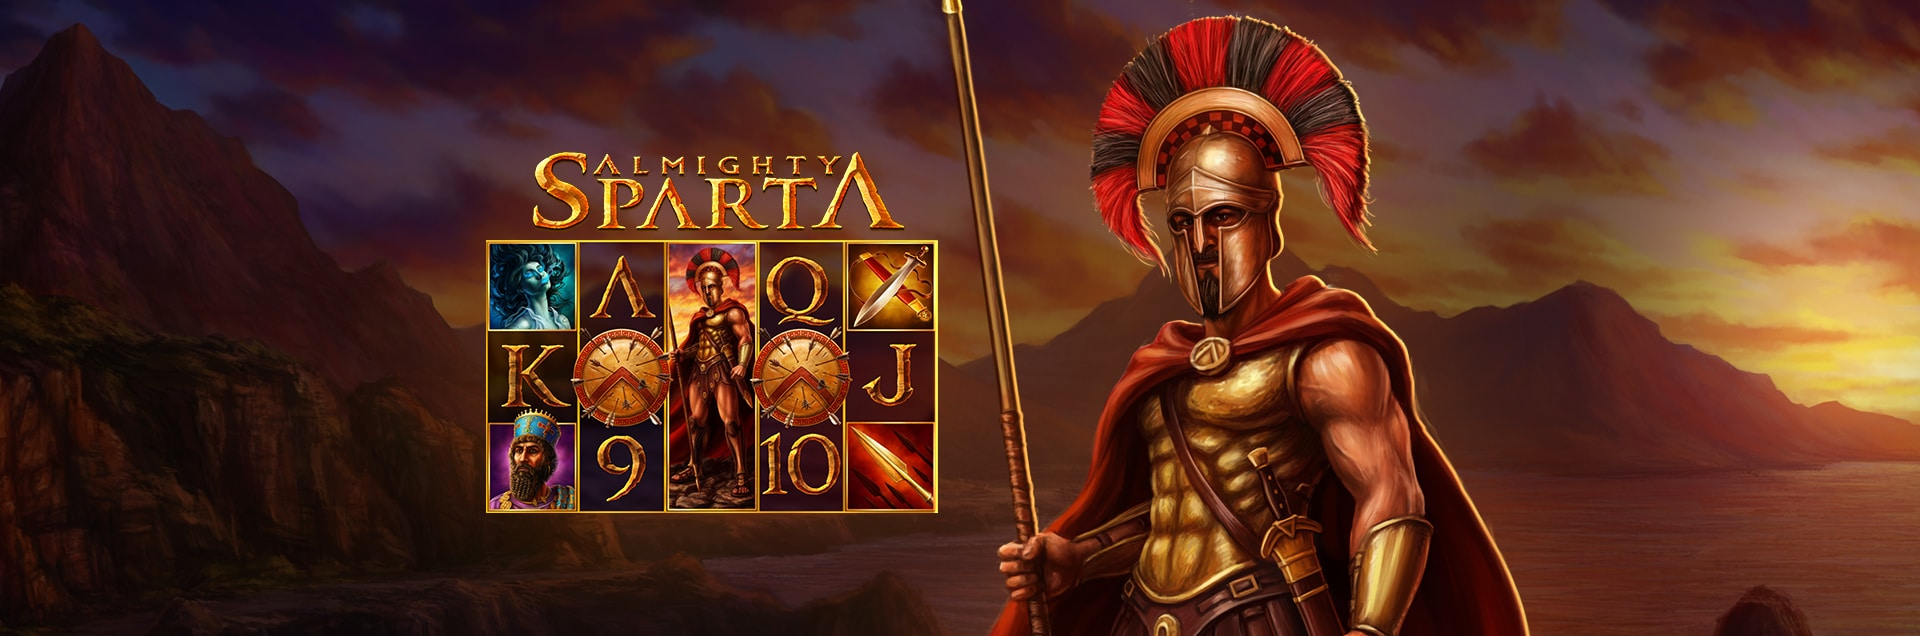 Sparta1 1